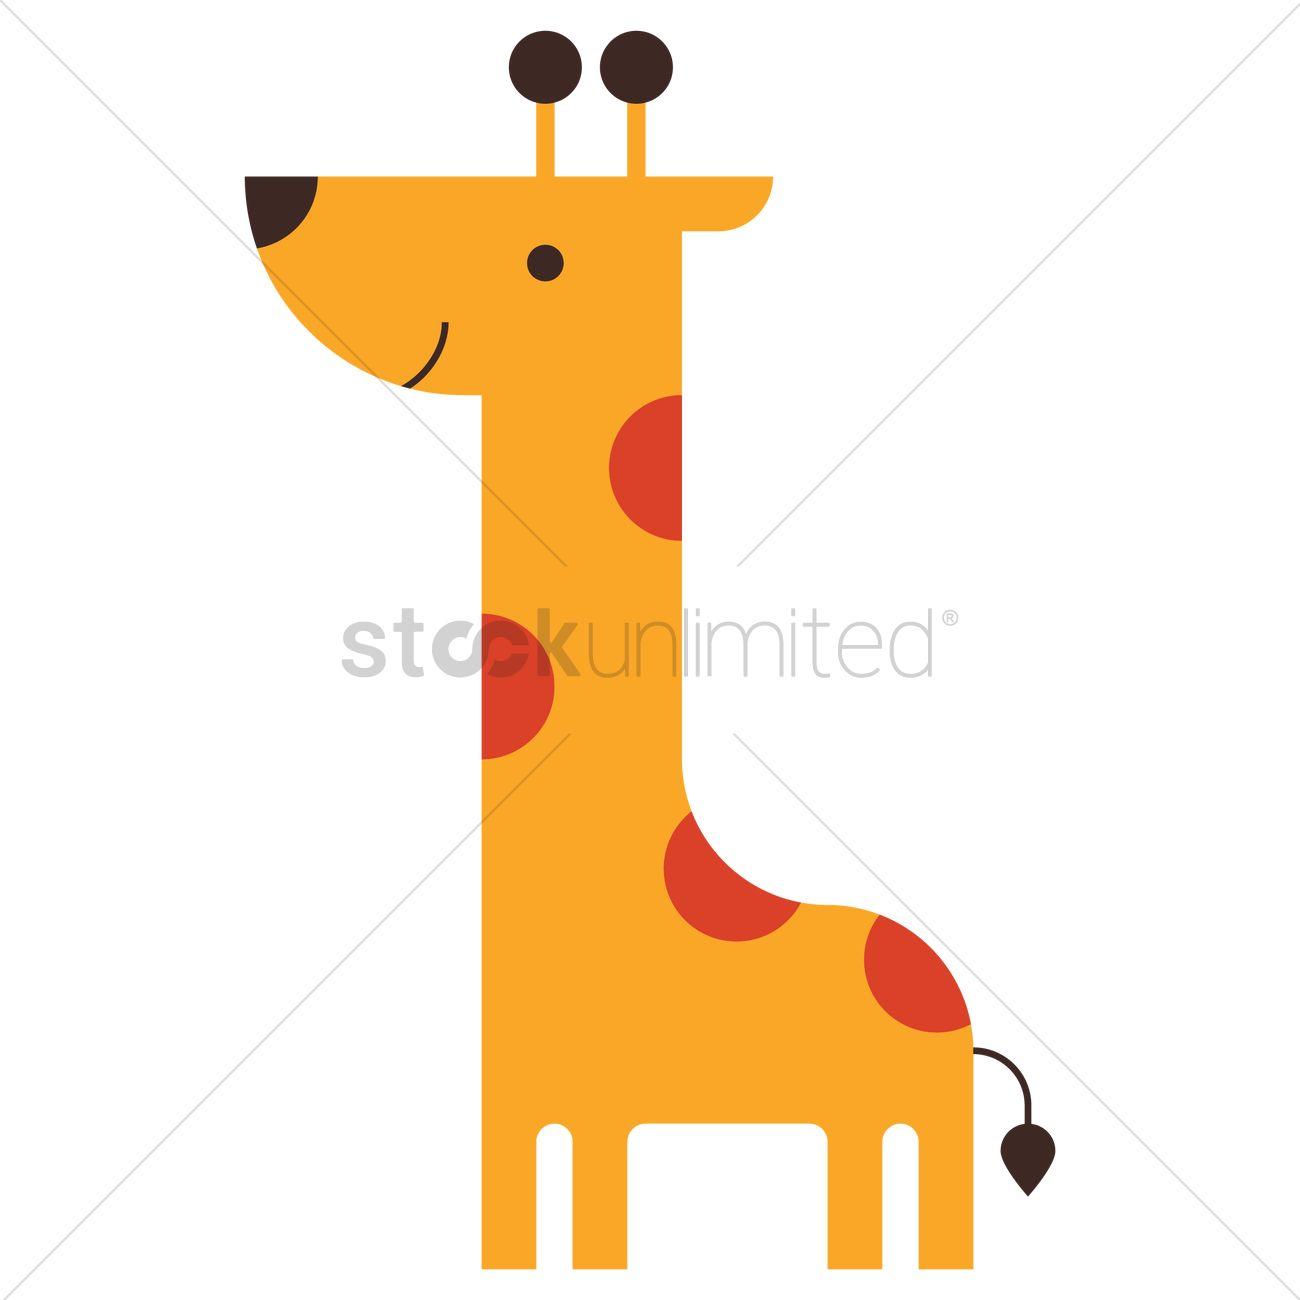 Cartoon Giraffe Vector Image 2100601 Stockunlimited